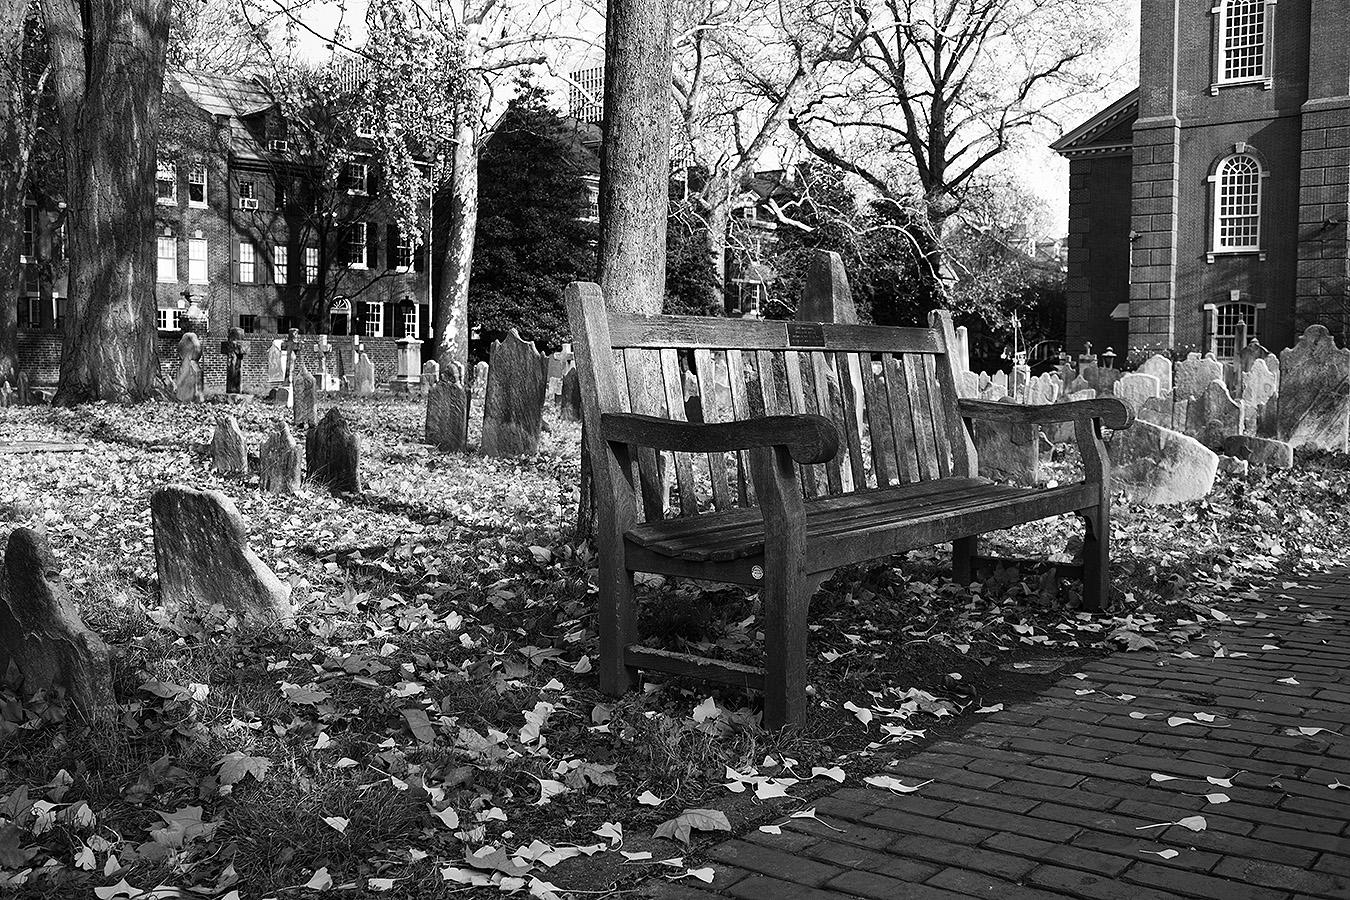 Anni_Liu_Photography_Individual_Project_24_Philadelphia_City_Grave-yard